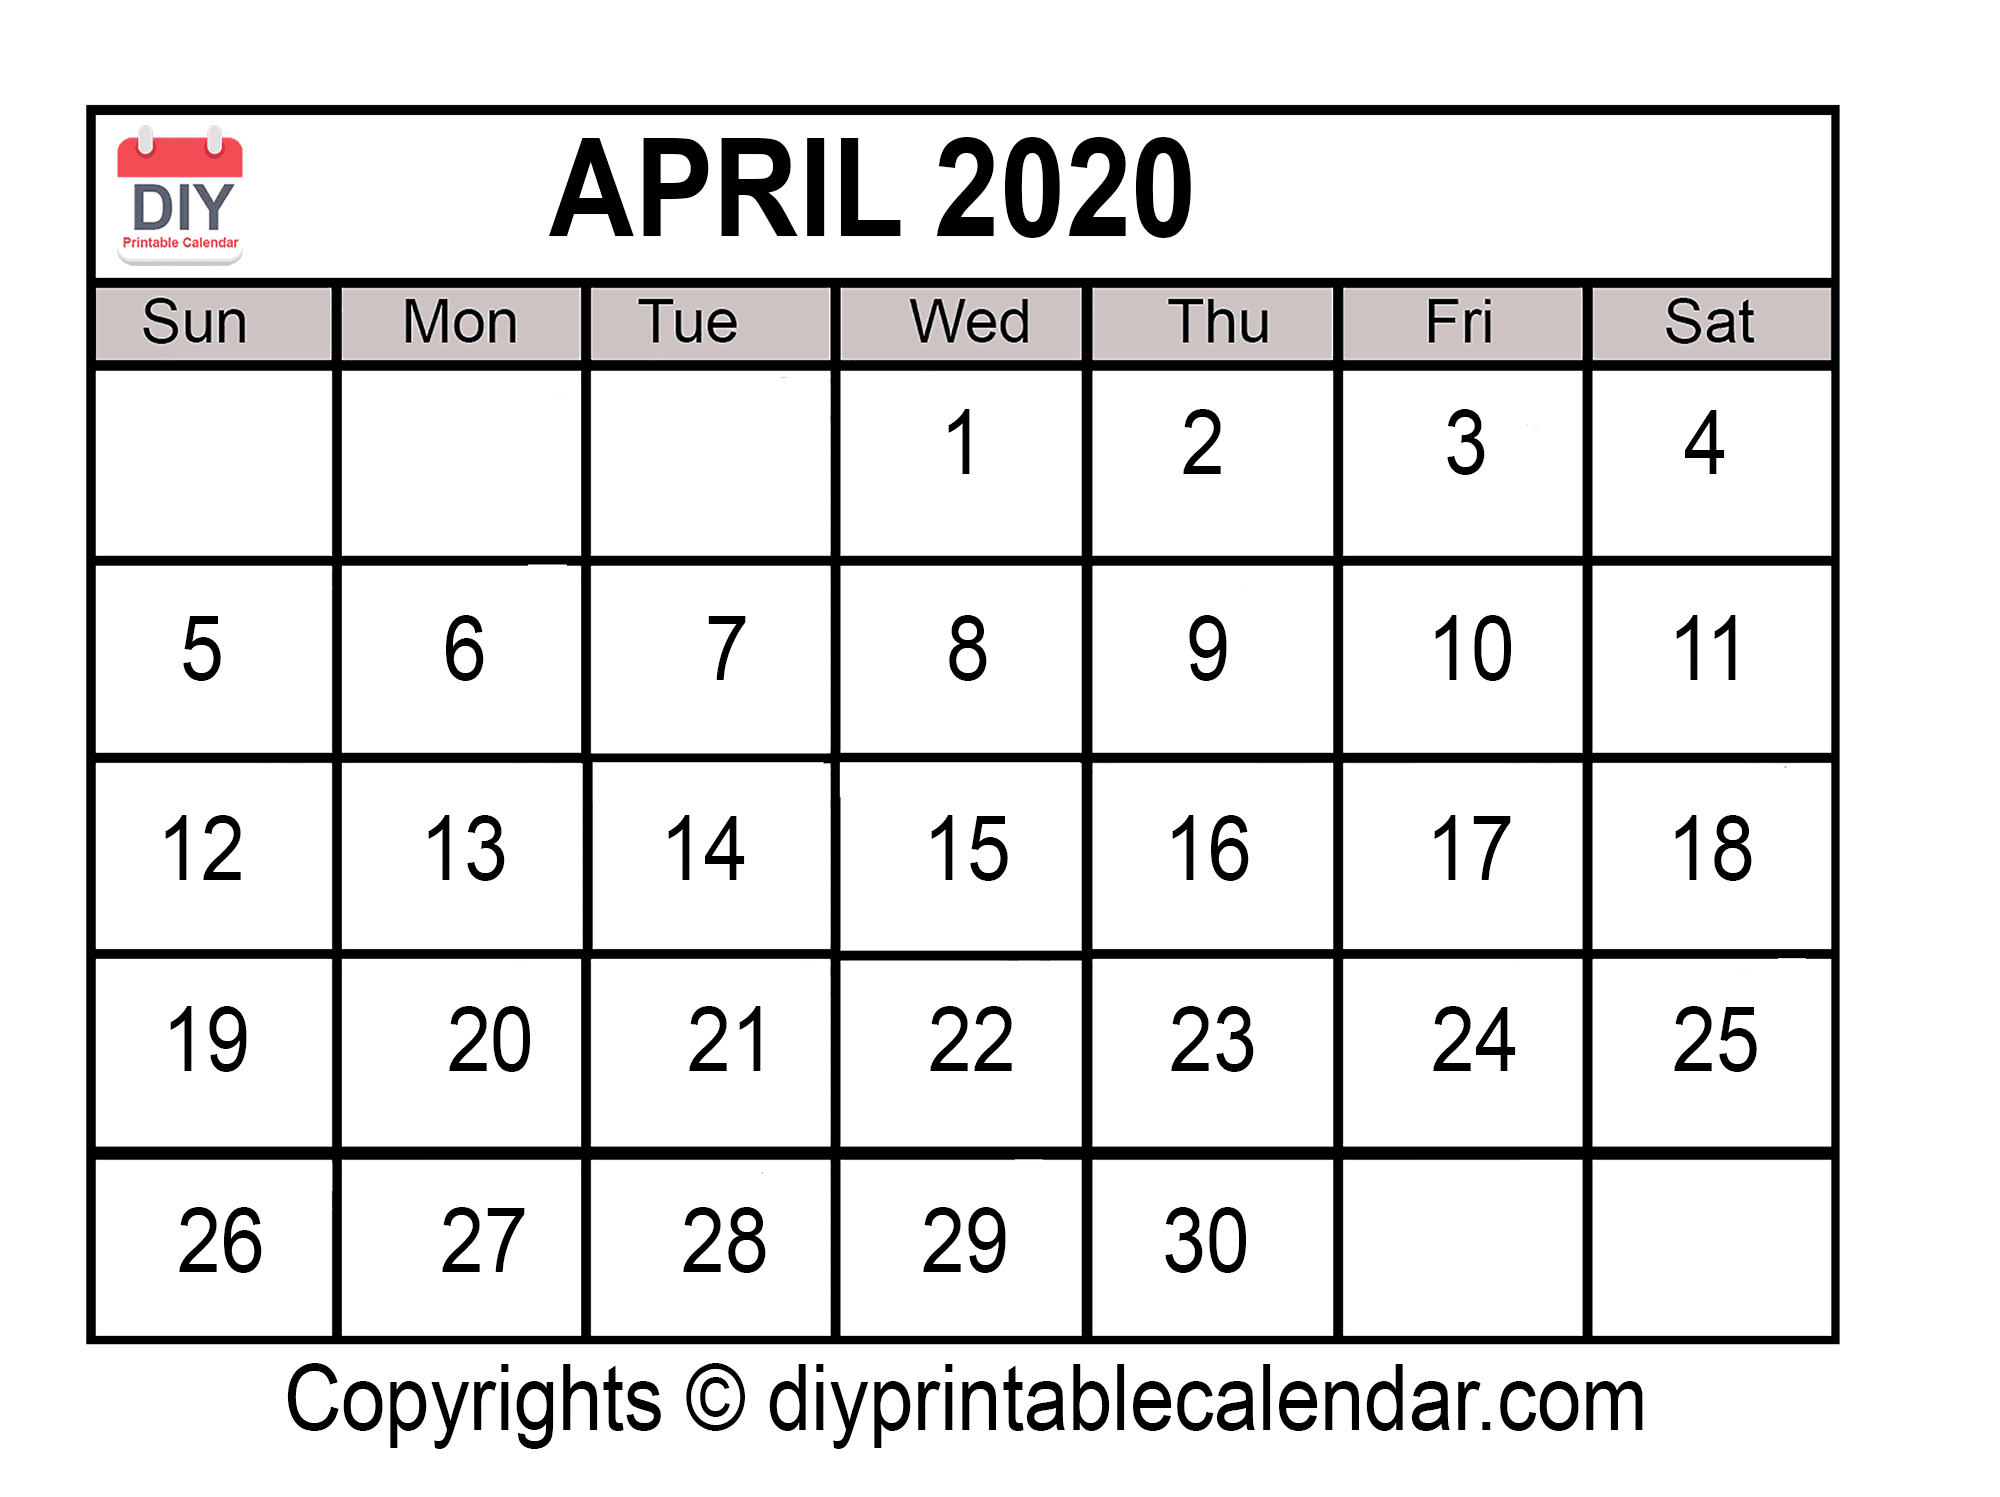 April 2020 Printable Calendar Template